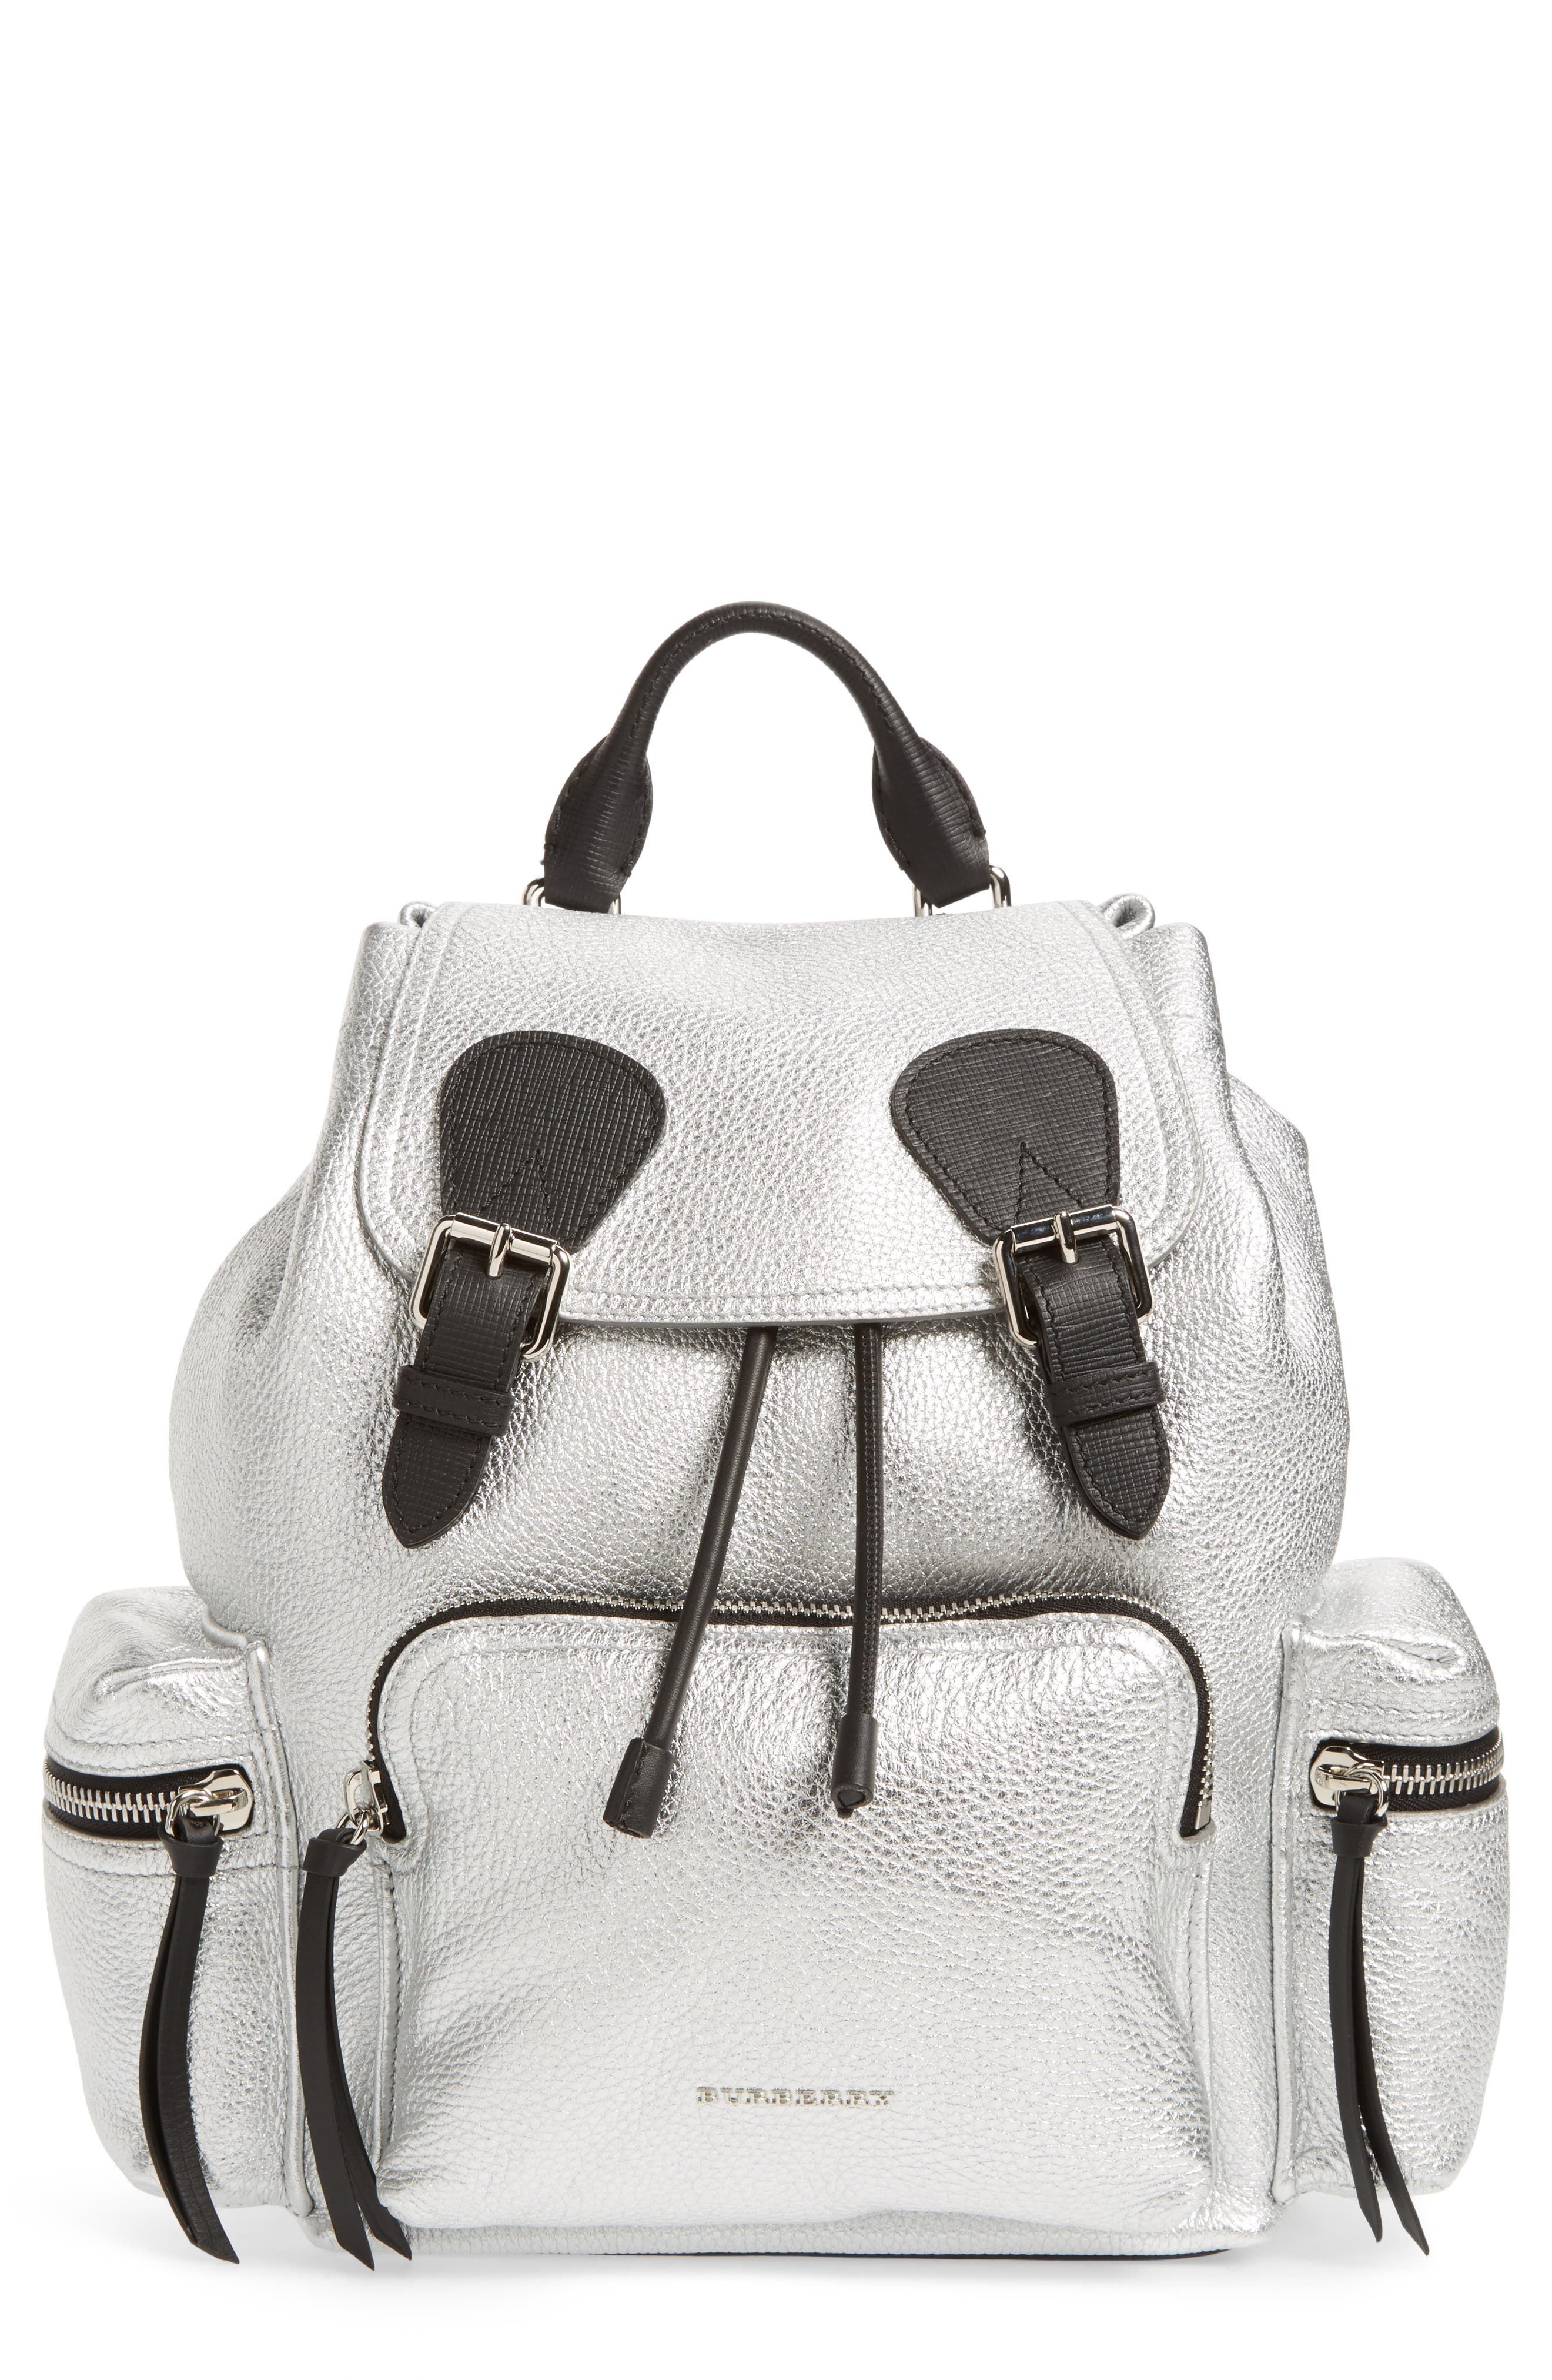 Burberry Medium Rucksack Metallic Leather Backpack